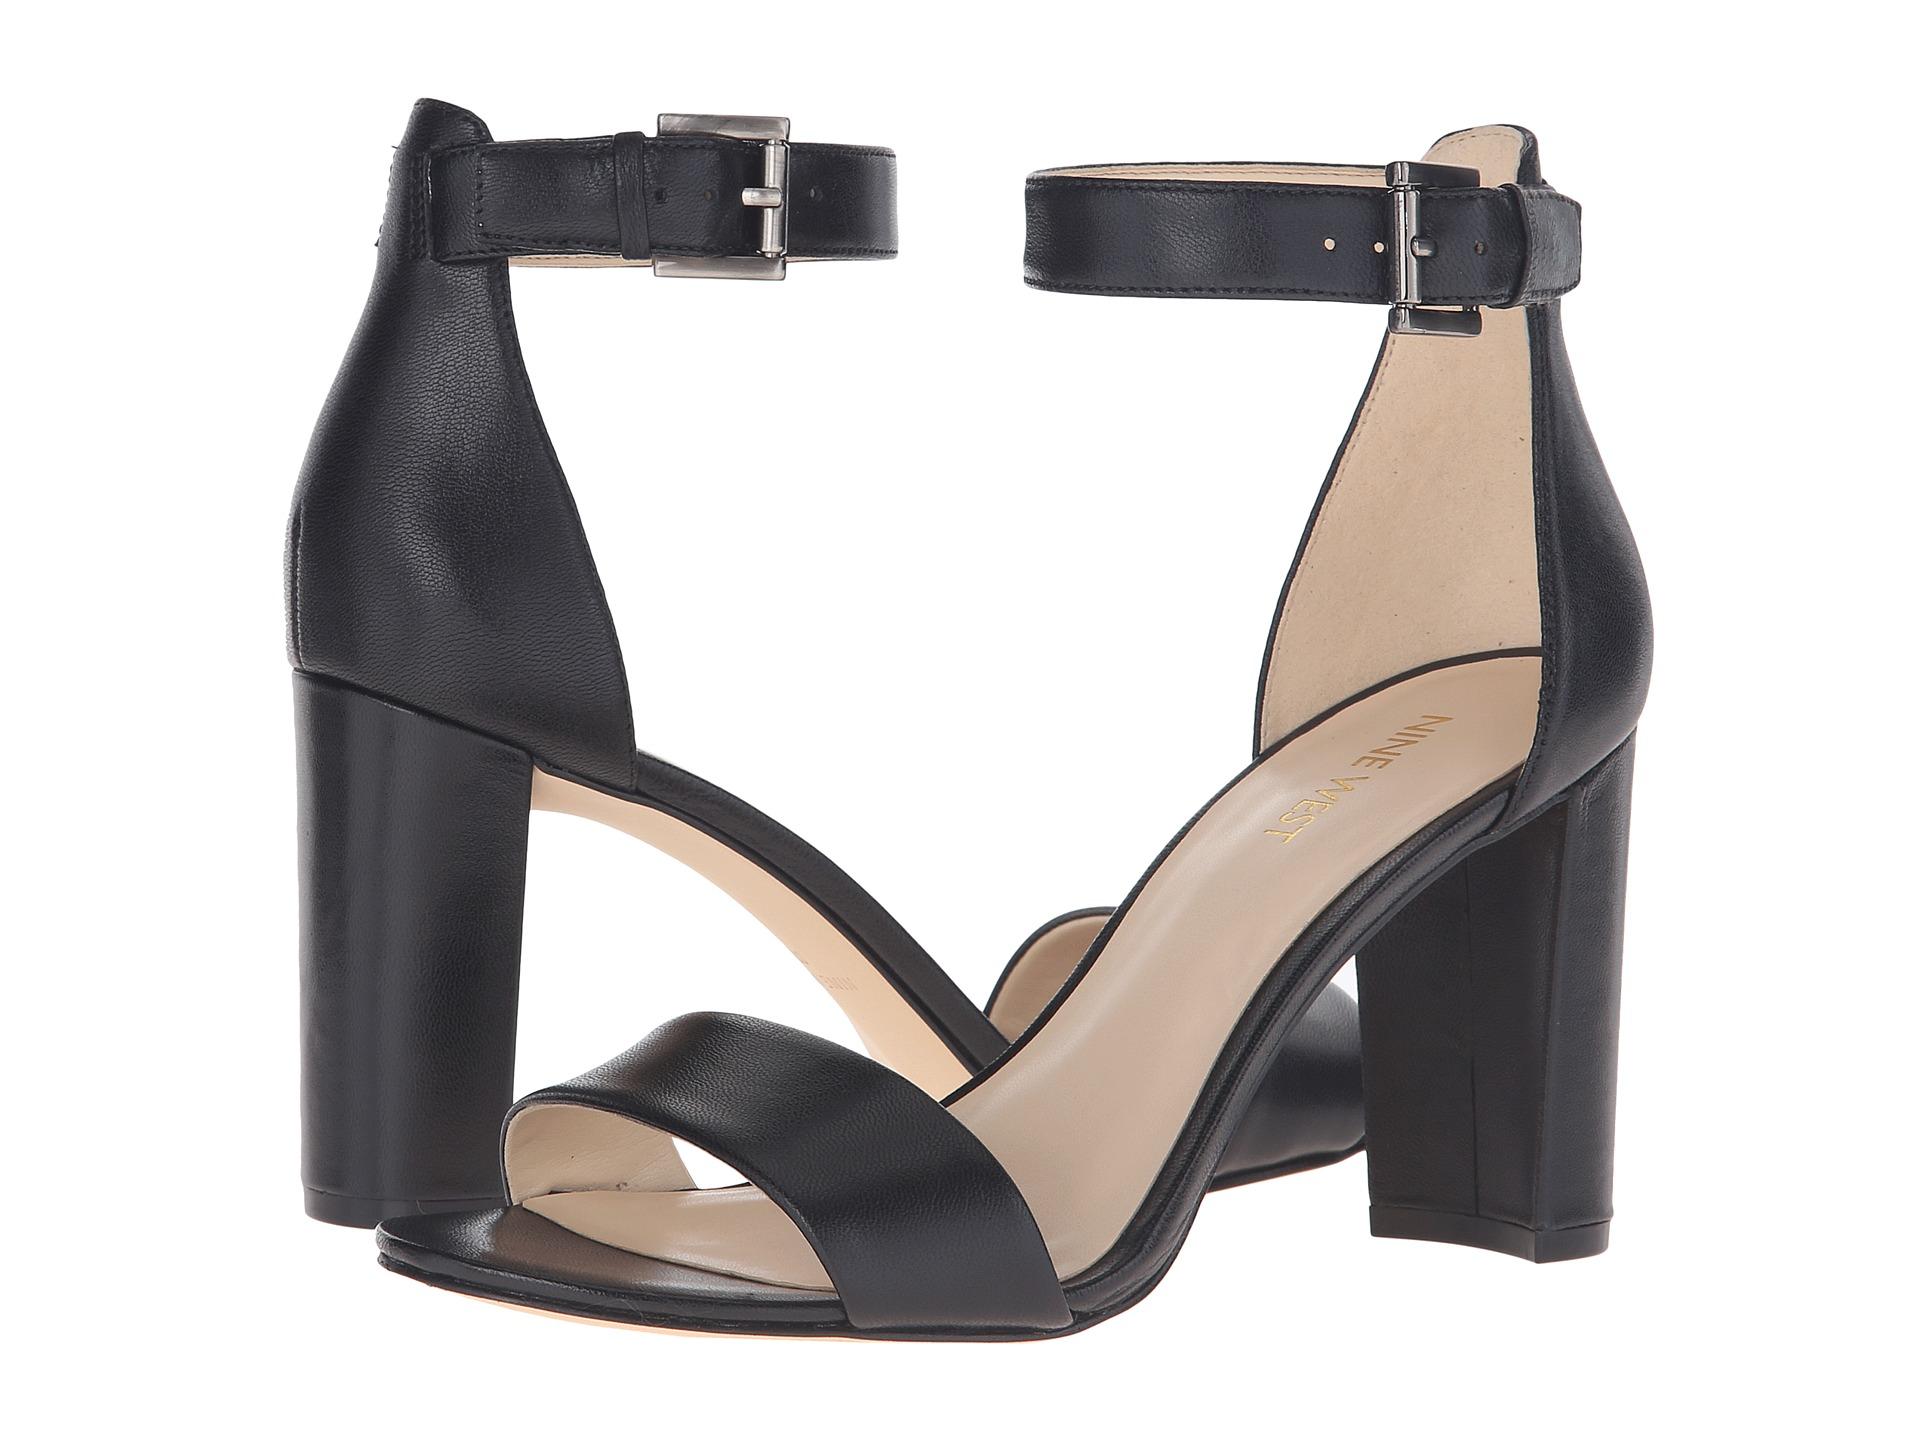 Black sandals nine west - Black Sandals Nine West 30